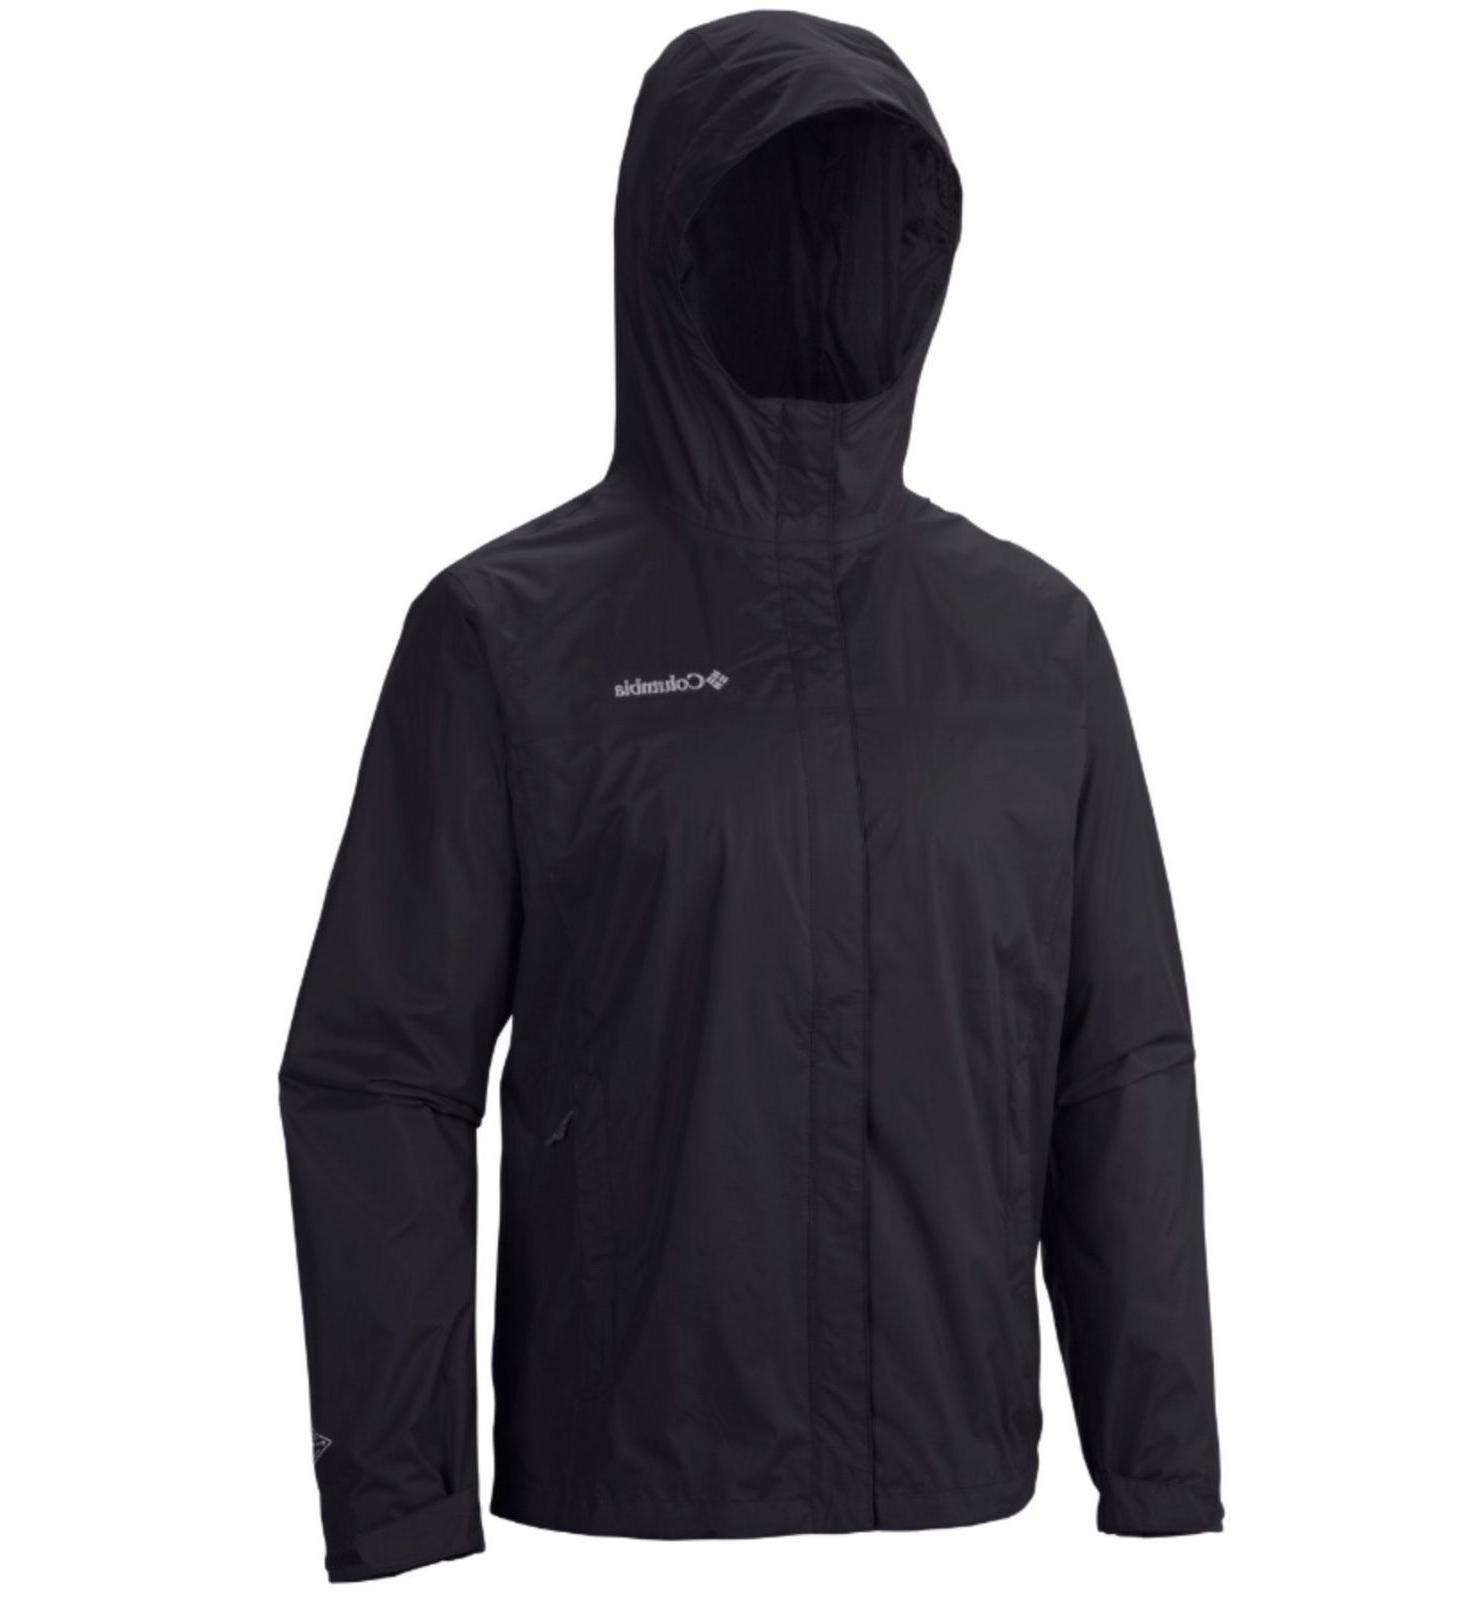 New mens Pointe jacket